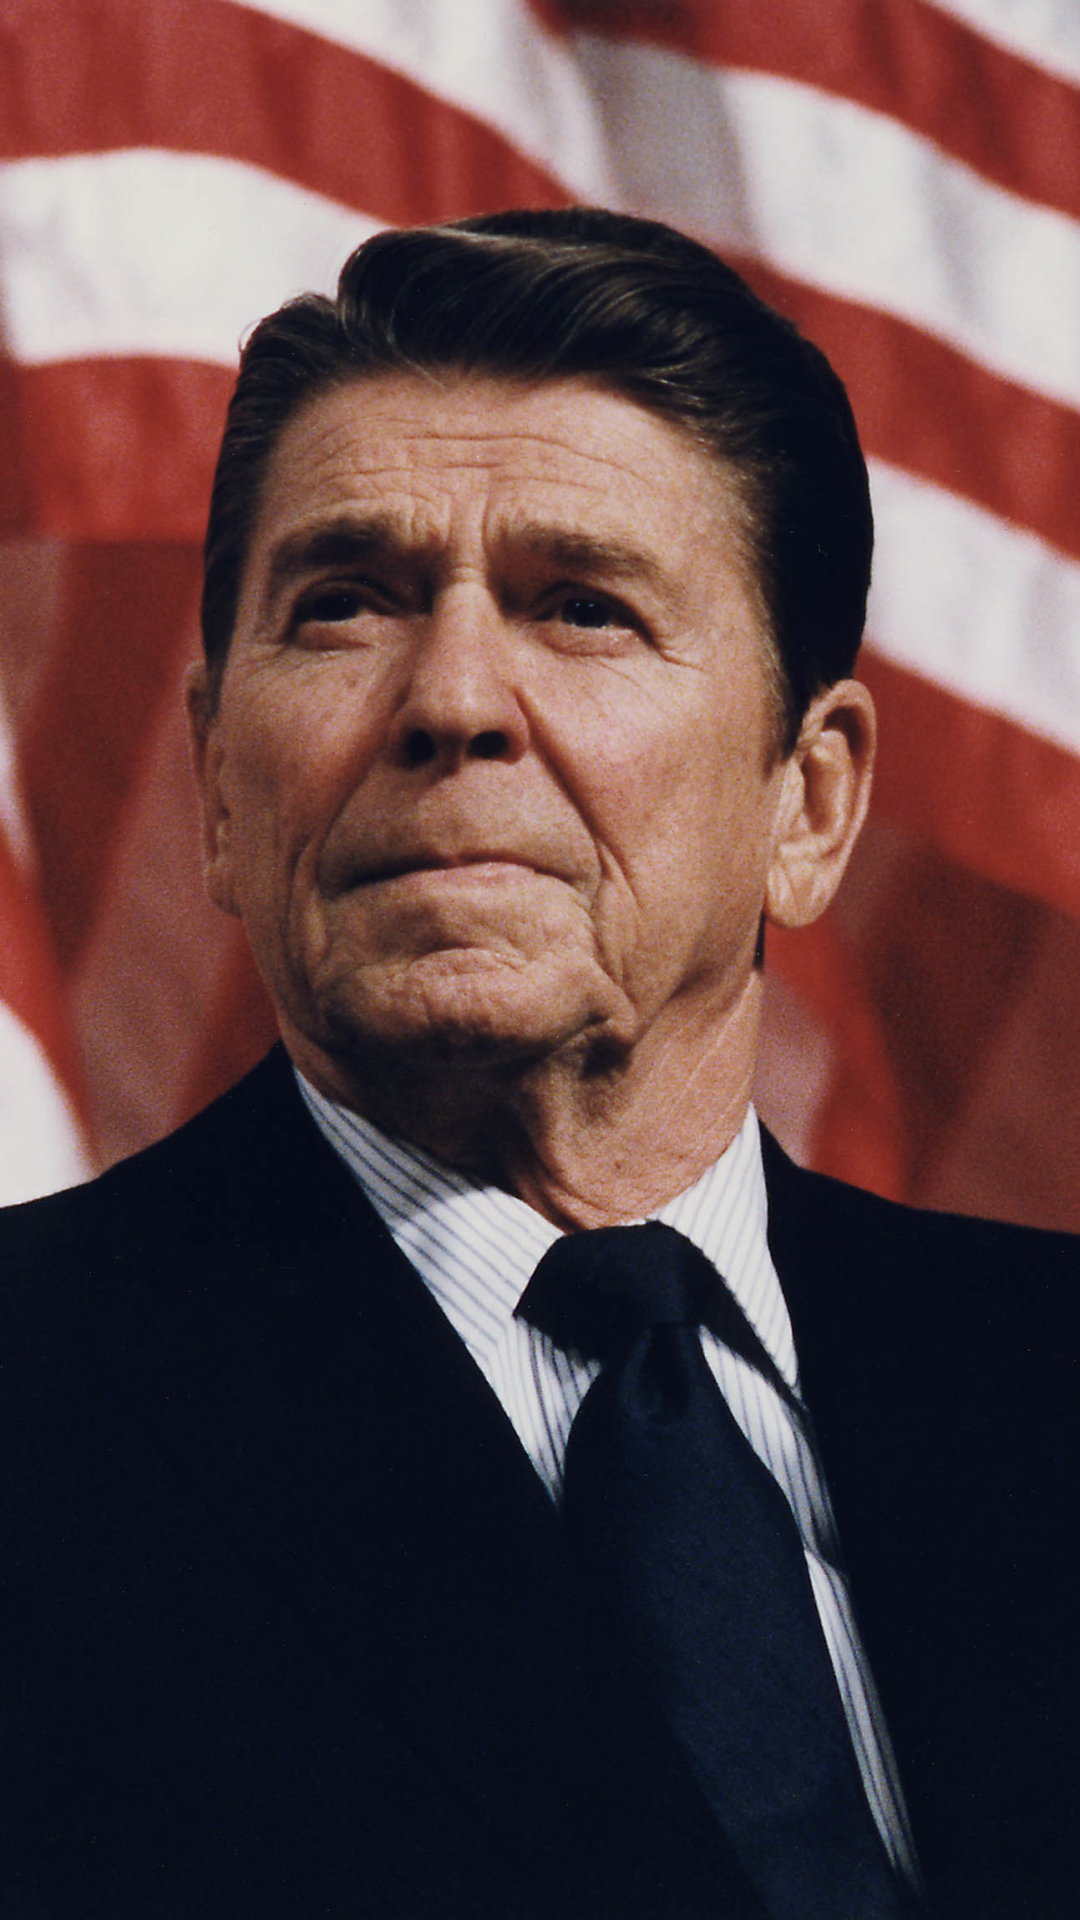 Ronald Reagan Wallpapers 95 Wallpapers   HD Wallpapers